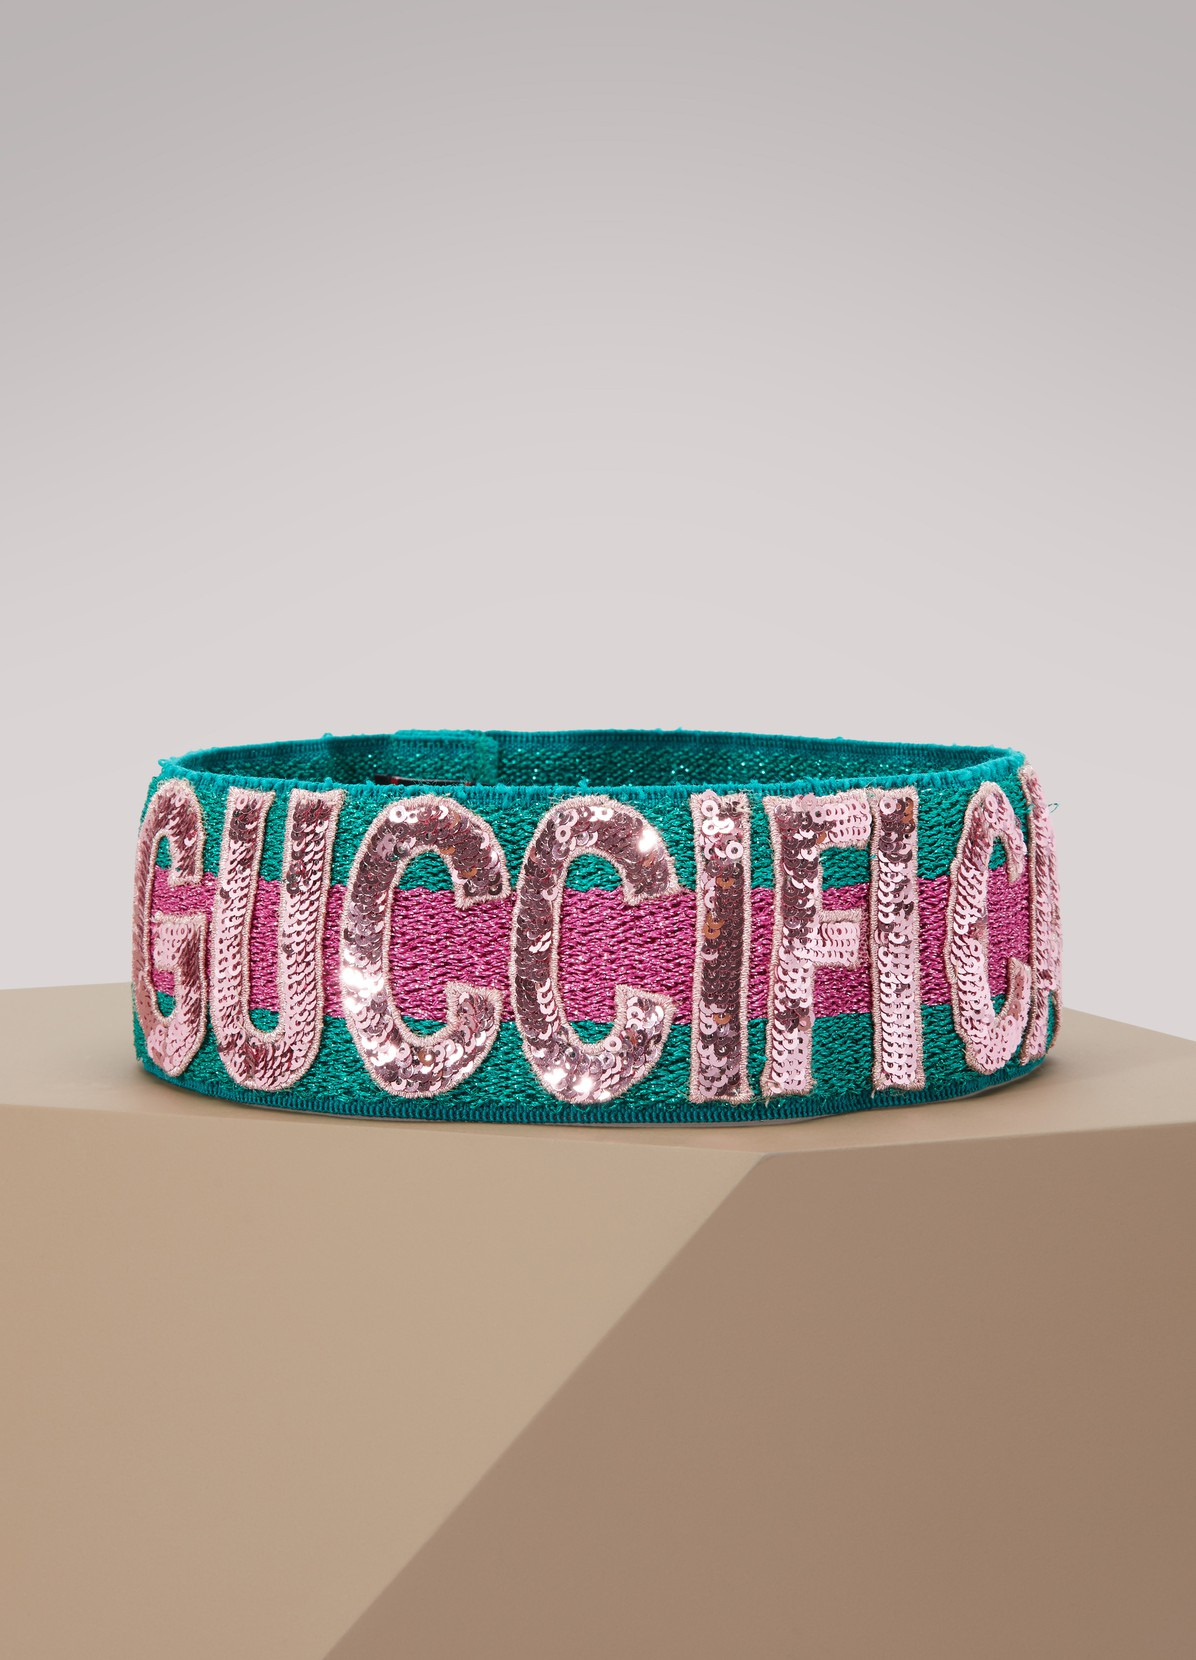 Sequin Guccification headband